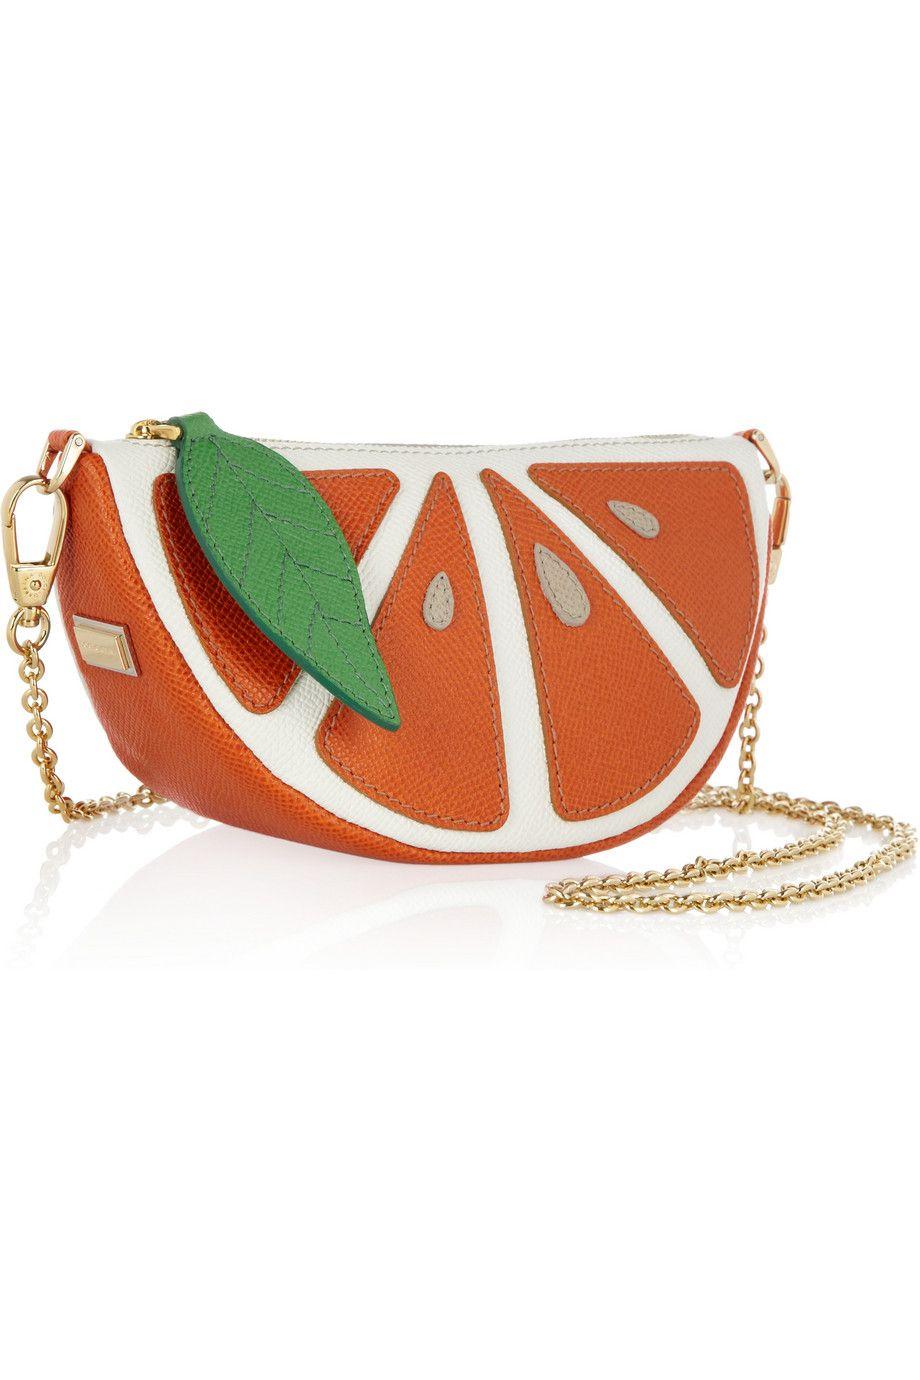 704c8b25877 Dolce & Gabbana Textured-leather orange segment shoulder bag | Looks ...